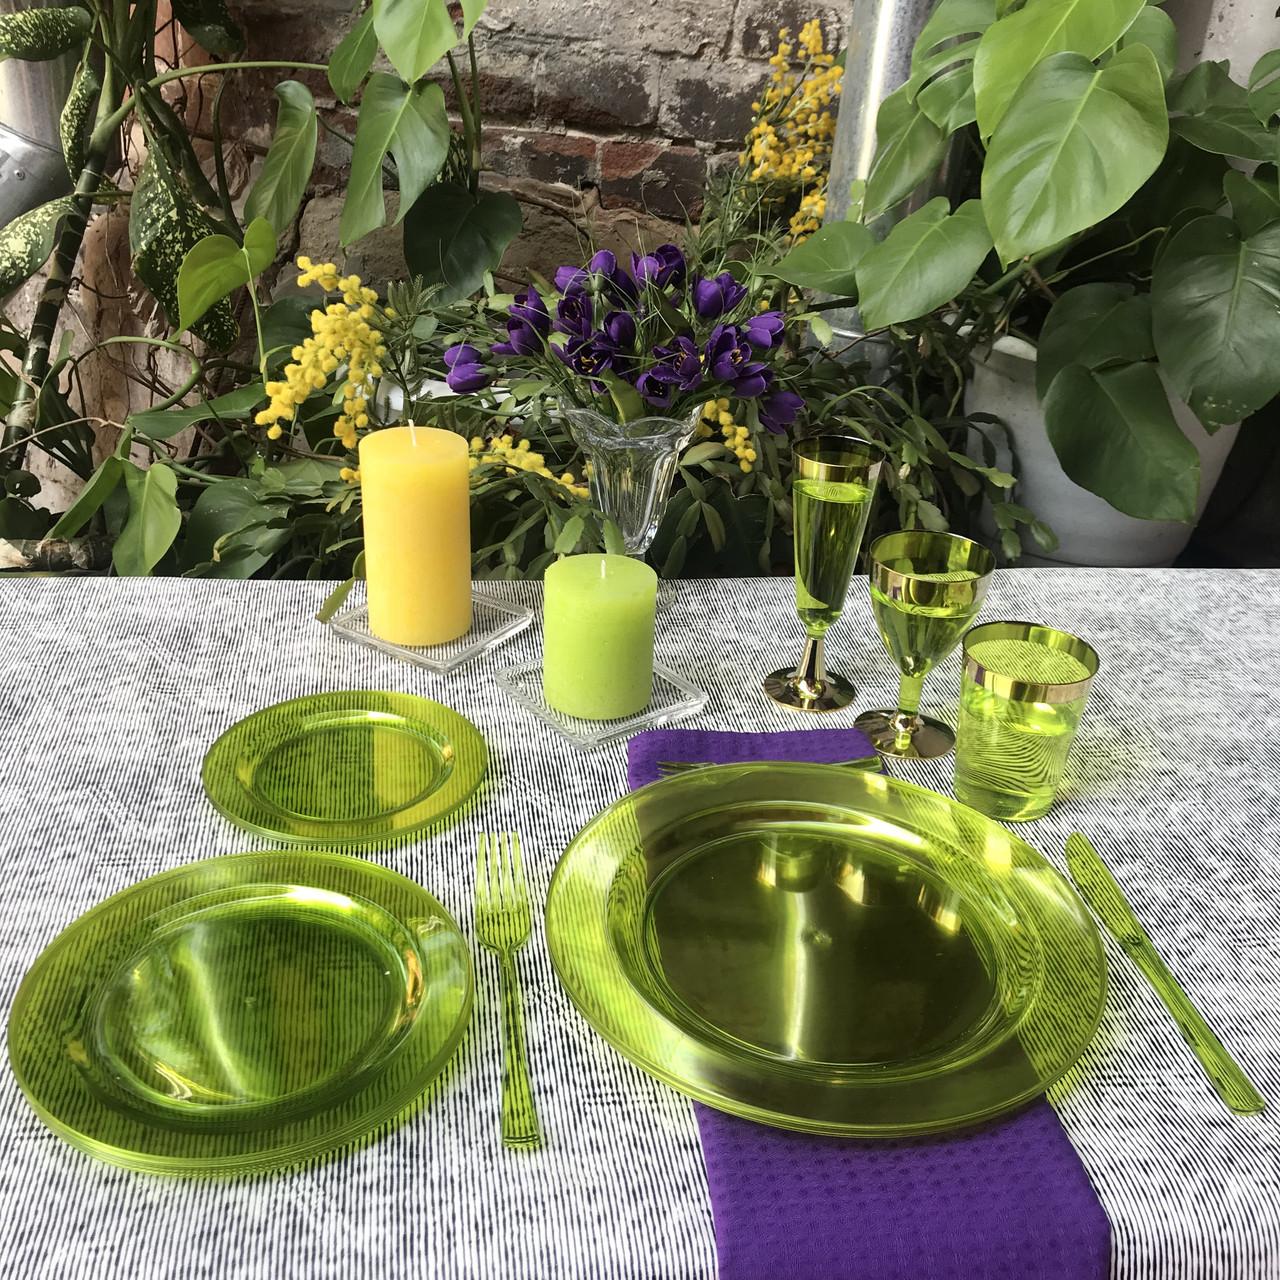 Пластиковая посуда красивая  стеклопластик  для праздника, банкета, фуршета  84 шт 6 чел Capital For People